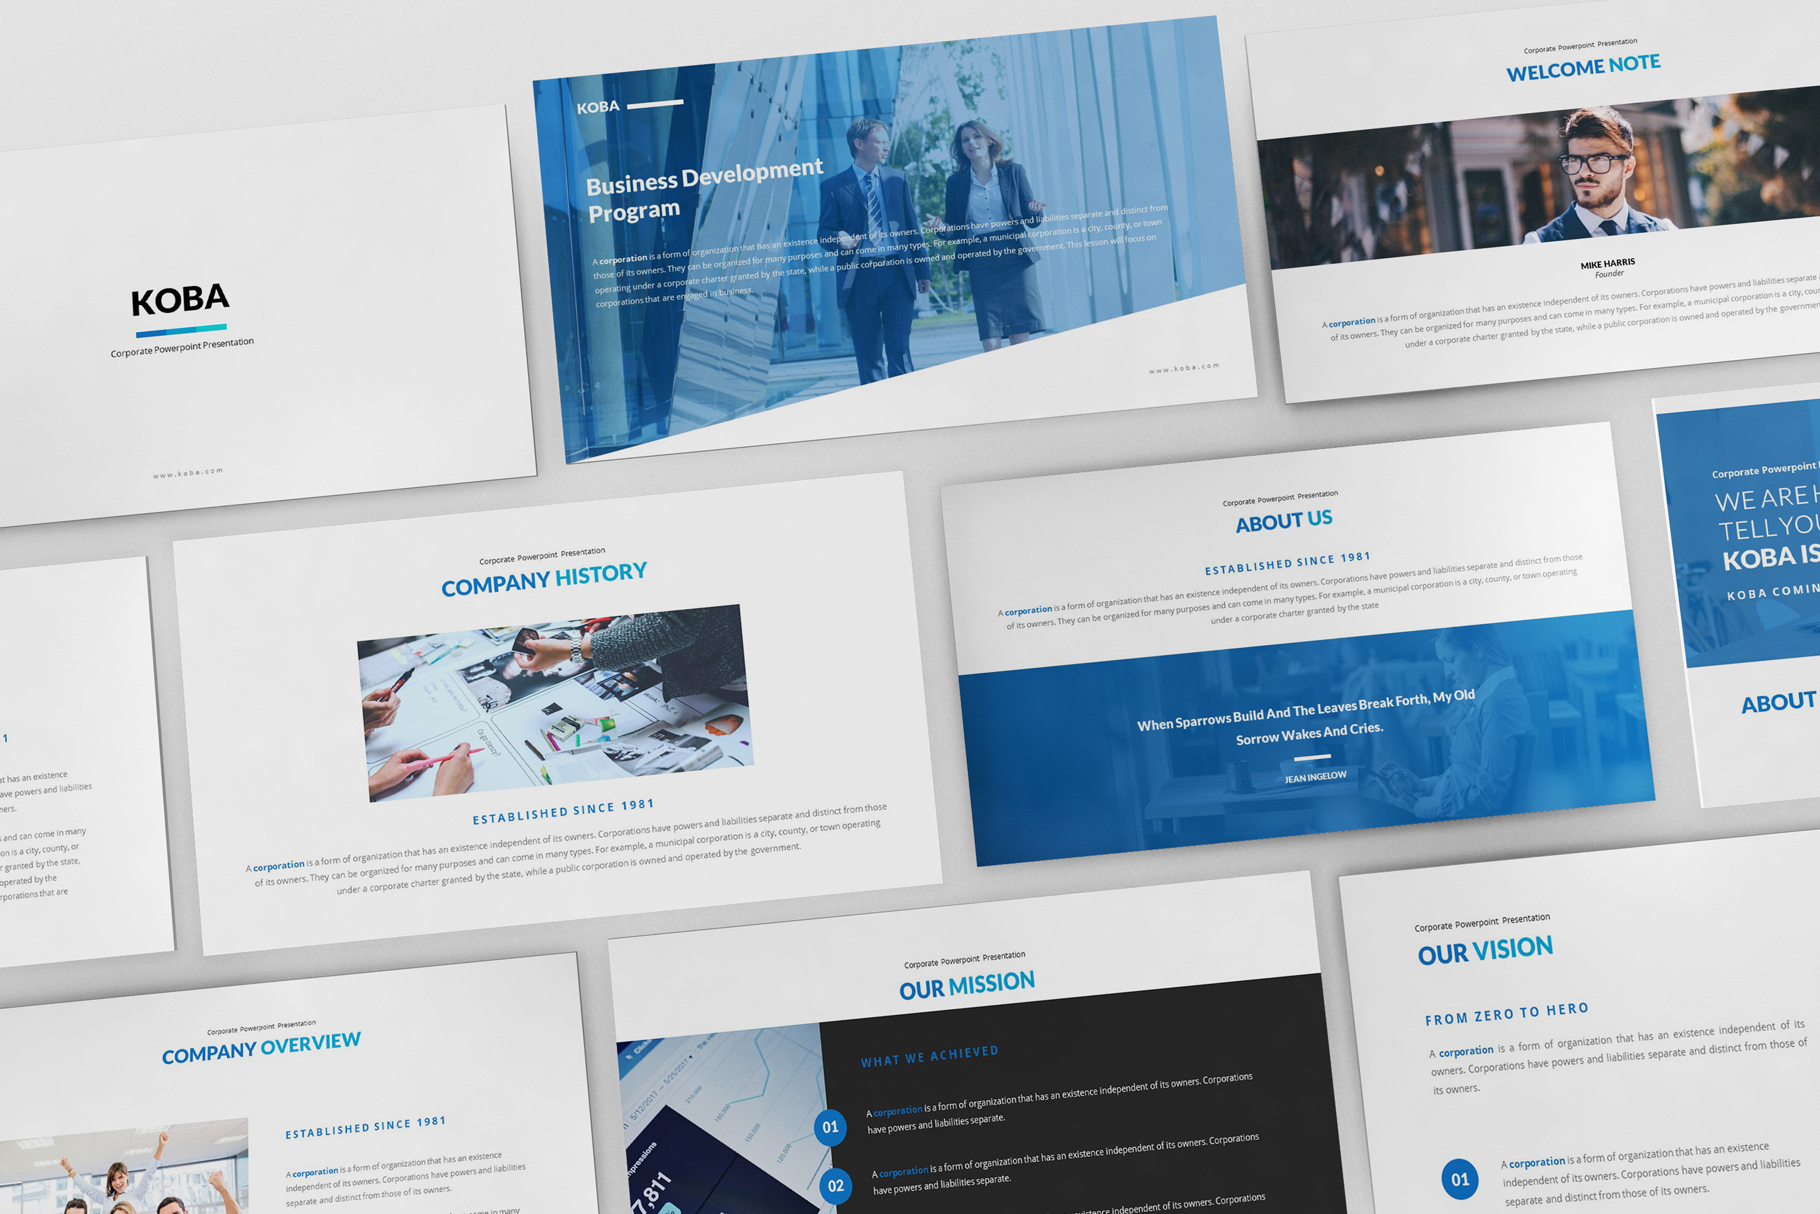 Koba Google Slides Presentation example image 2